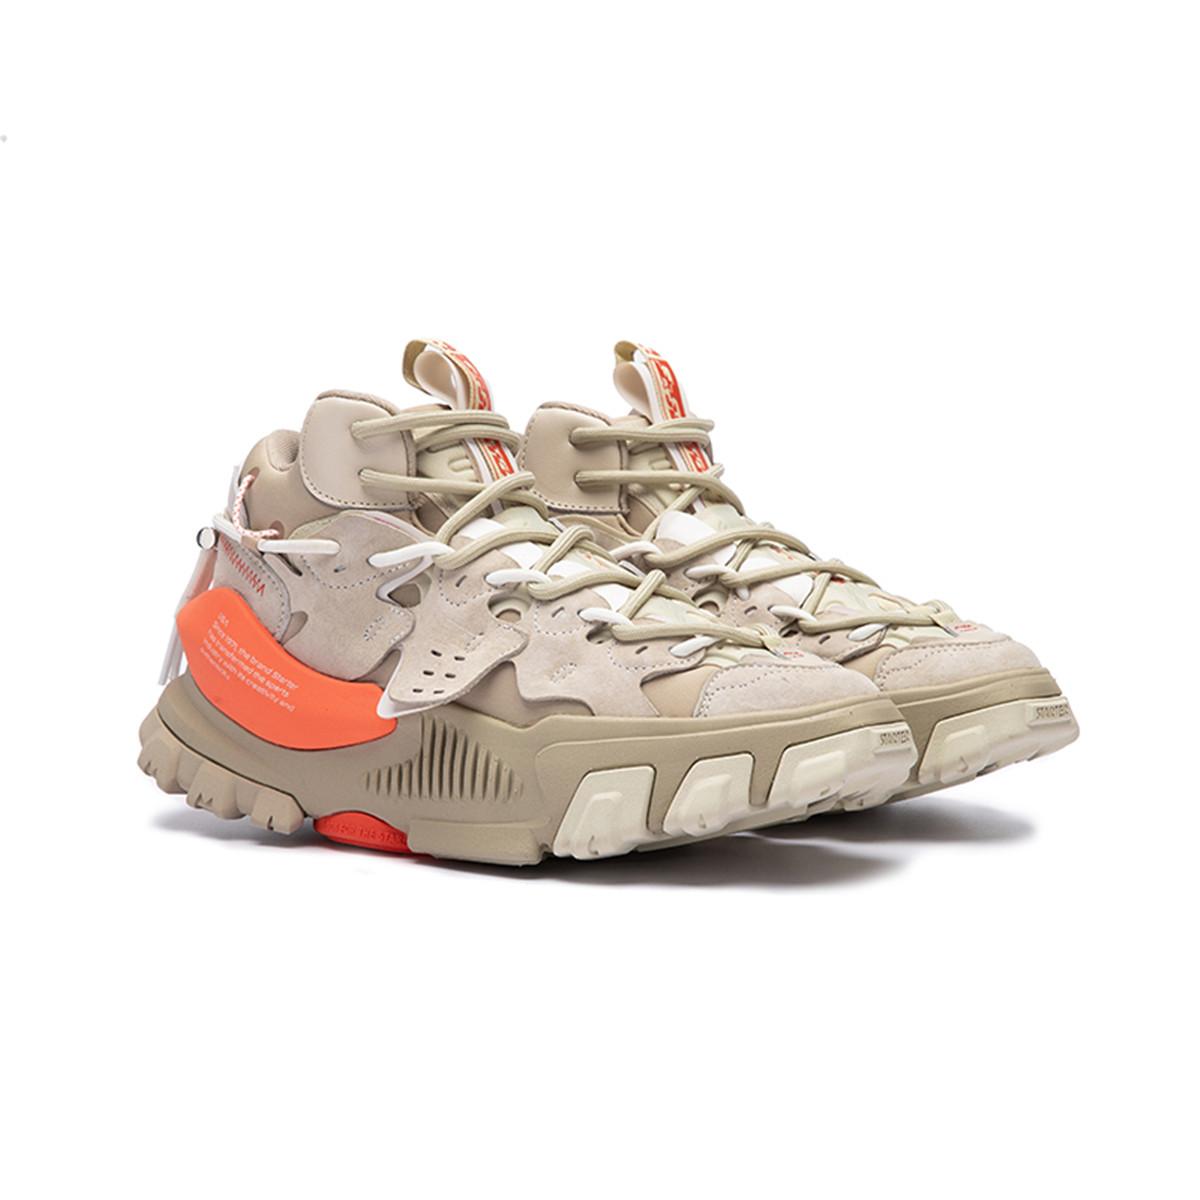 STARTER 男女同款CHAOS混沌空间飞船复古解构休闲老爹鞋